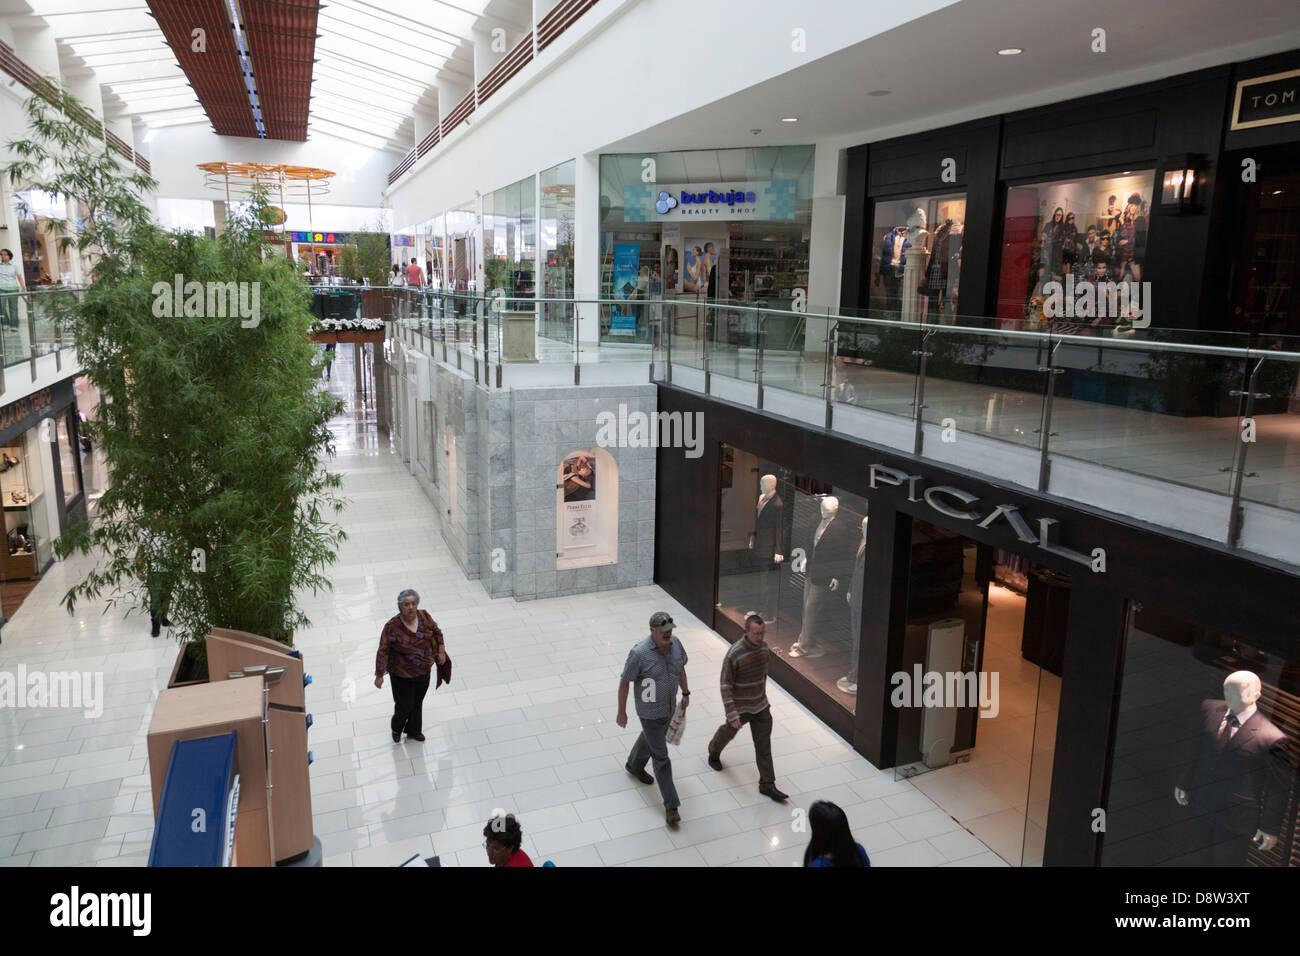 Quicentro Shopping Centre, Quito, New City, Ecuador - Stock Image